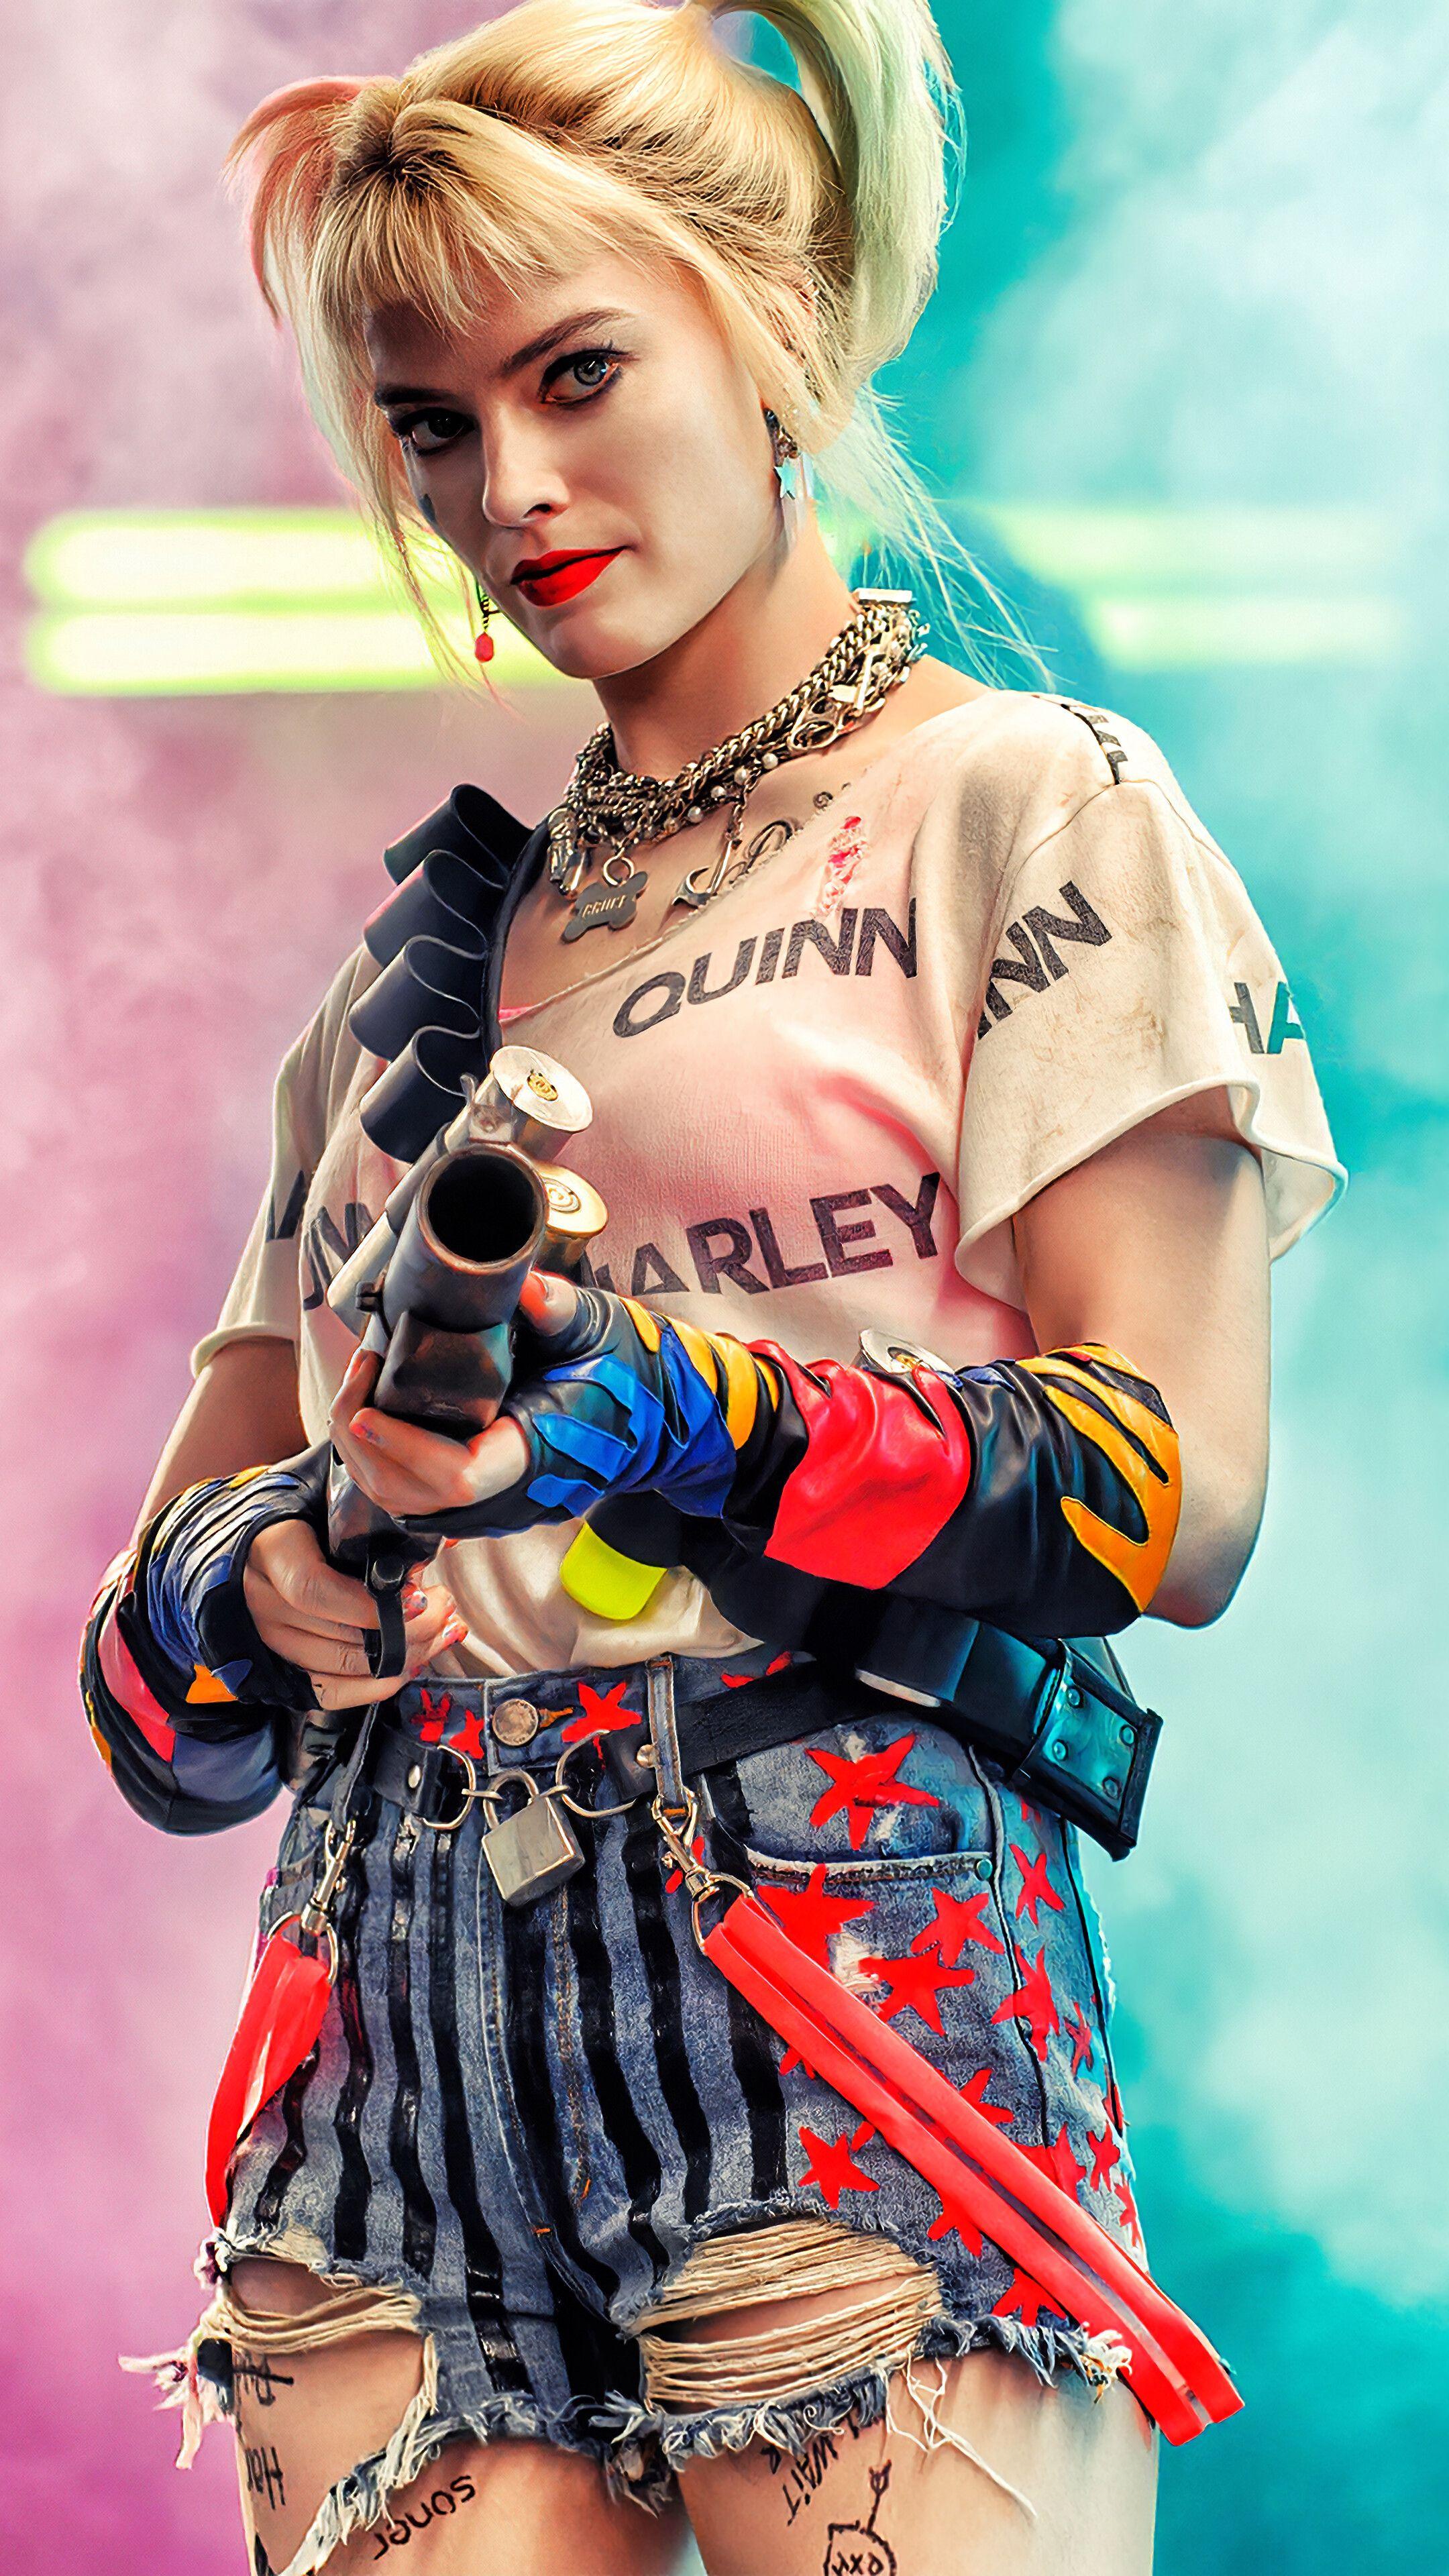 Iphone Ultra Hd Harley Quinn Wallpaper 4k ...